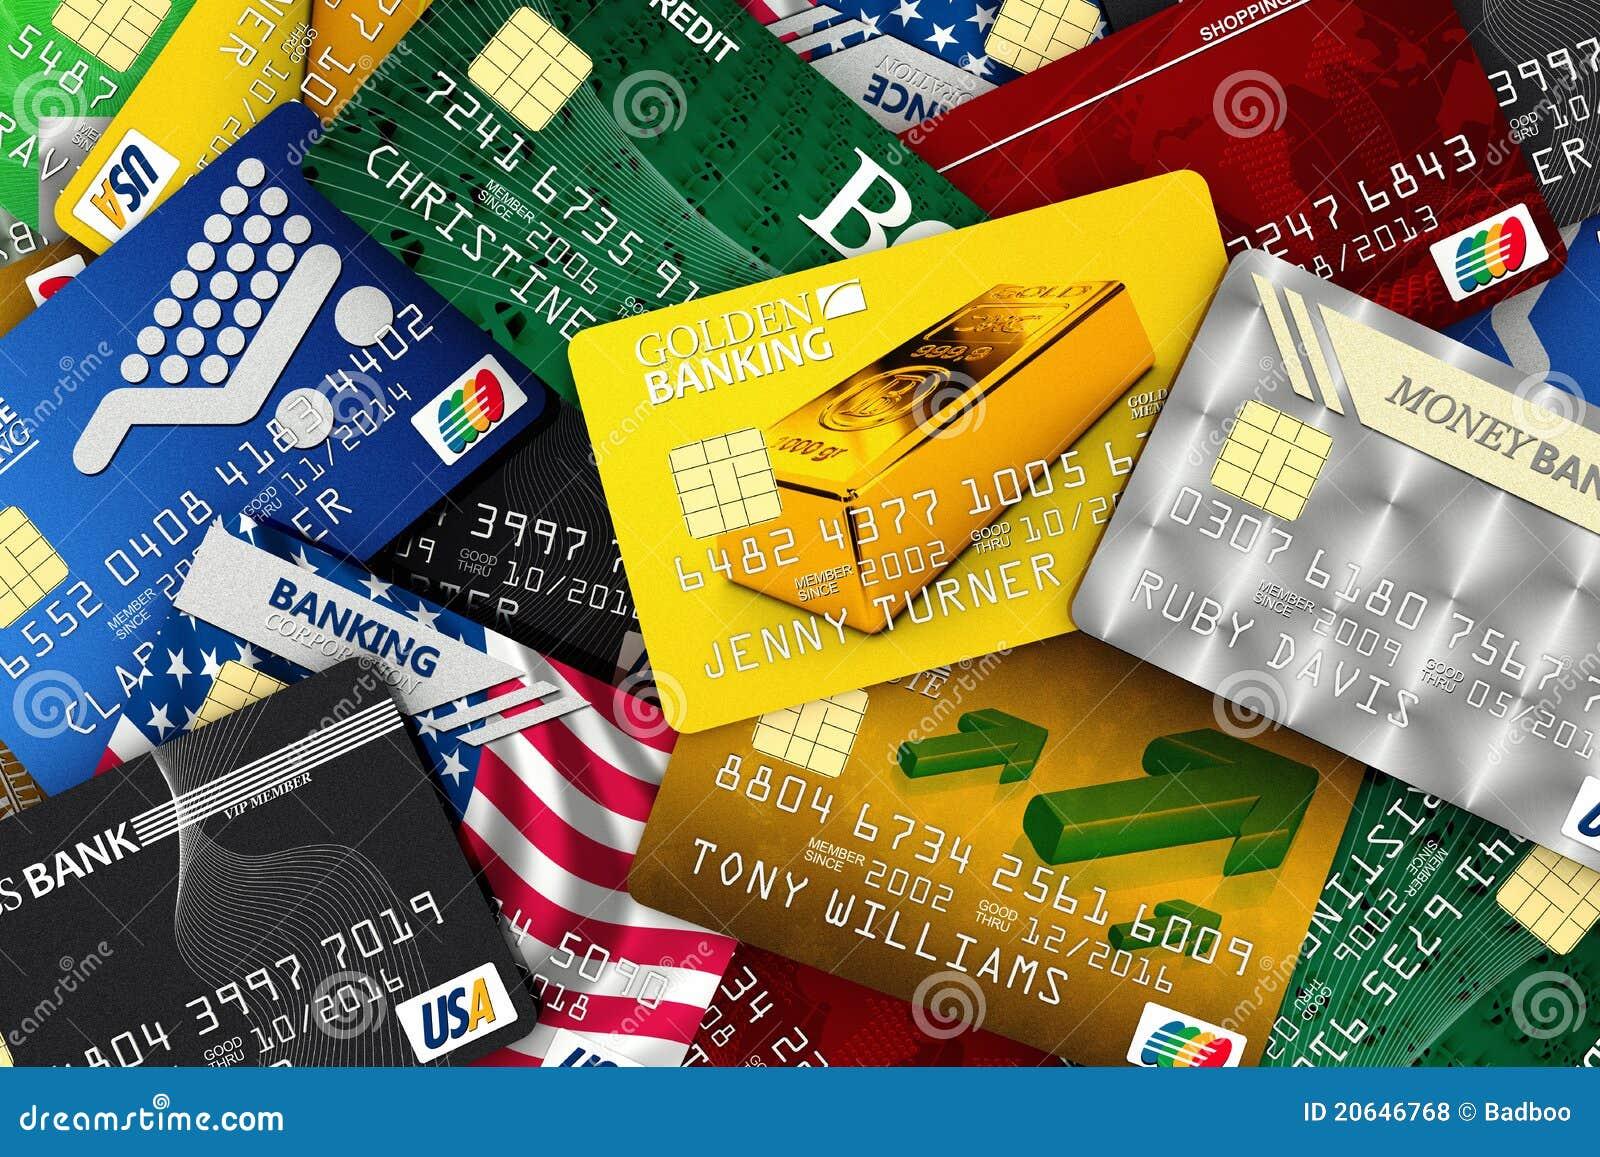 pile of credit cards stock illustration  illustration of